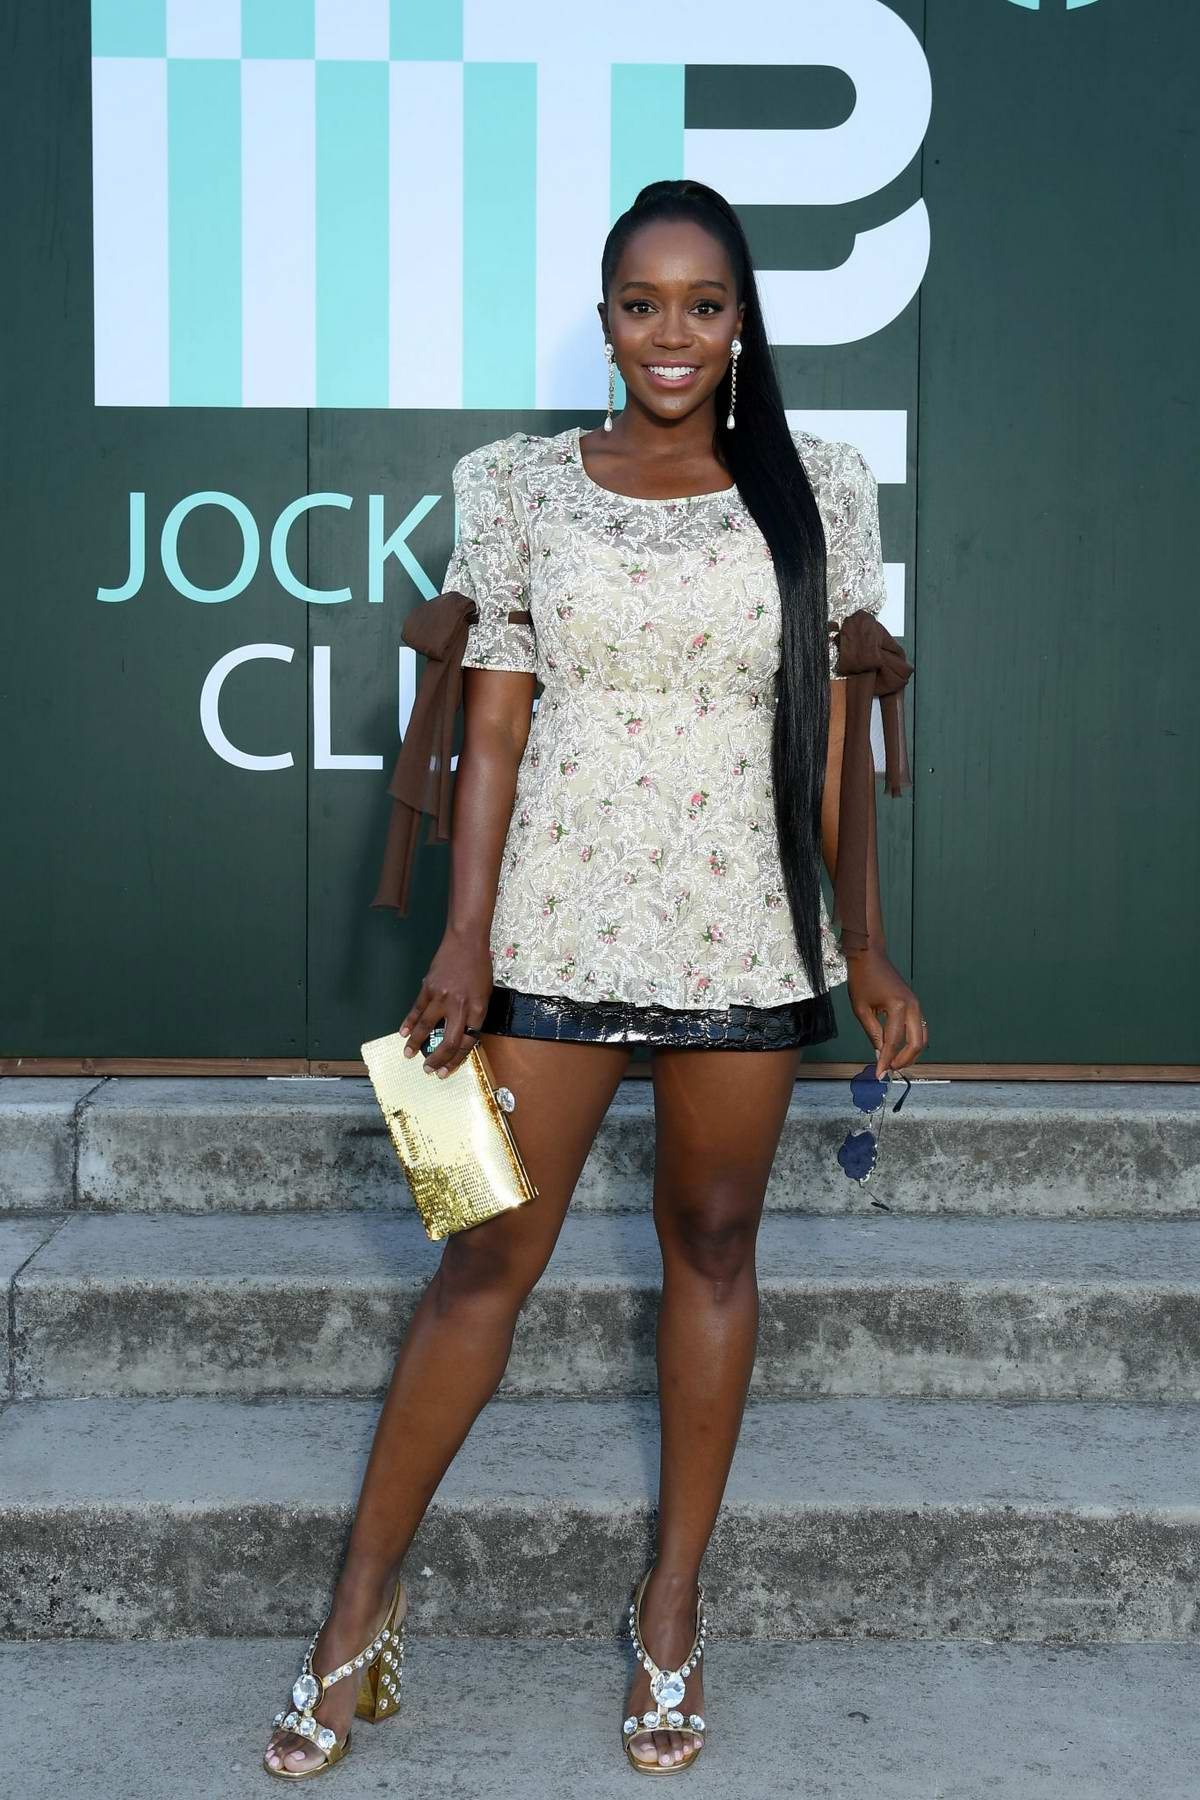 Aja Naomi King attends Miu Miu Club event at Hippodrome d'Auteuil in Paris, France